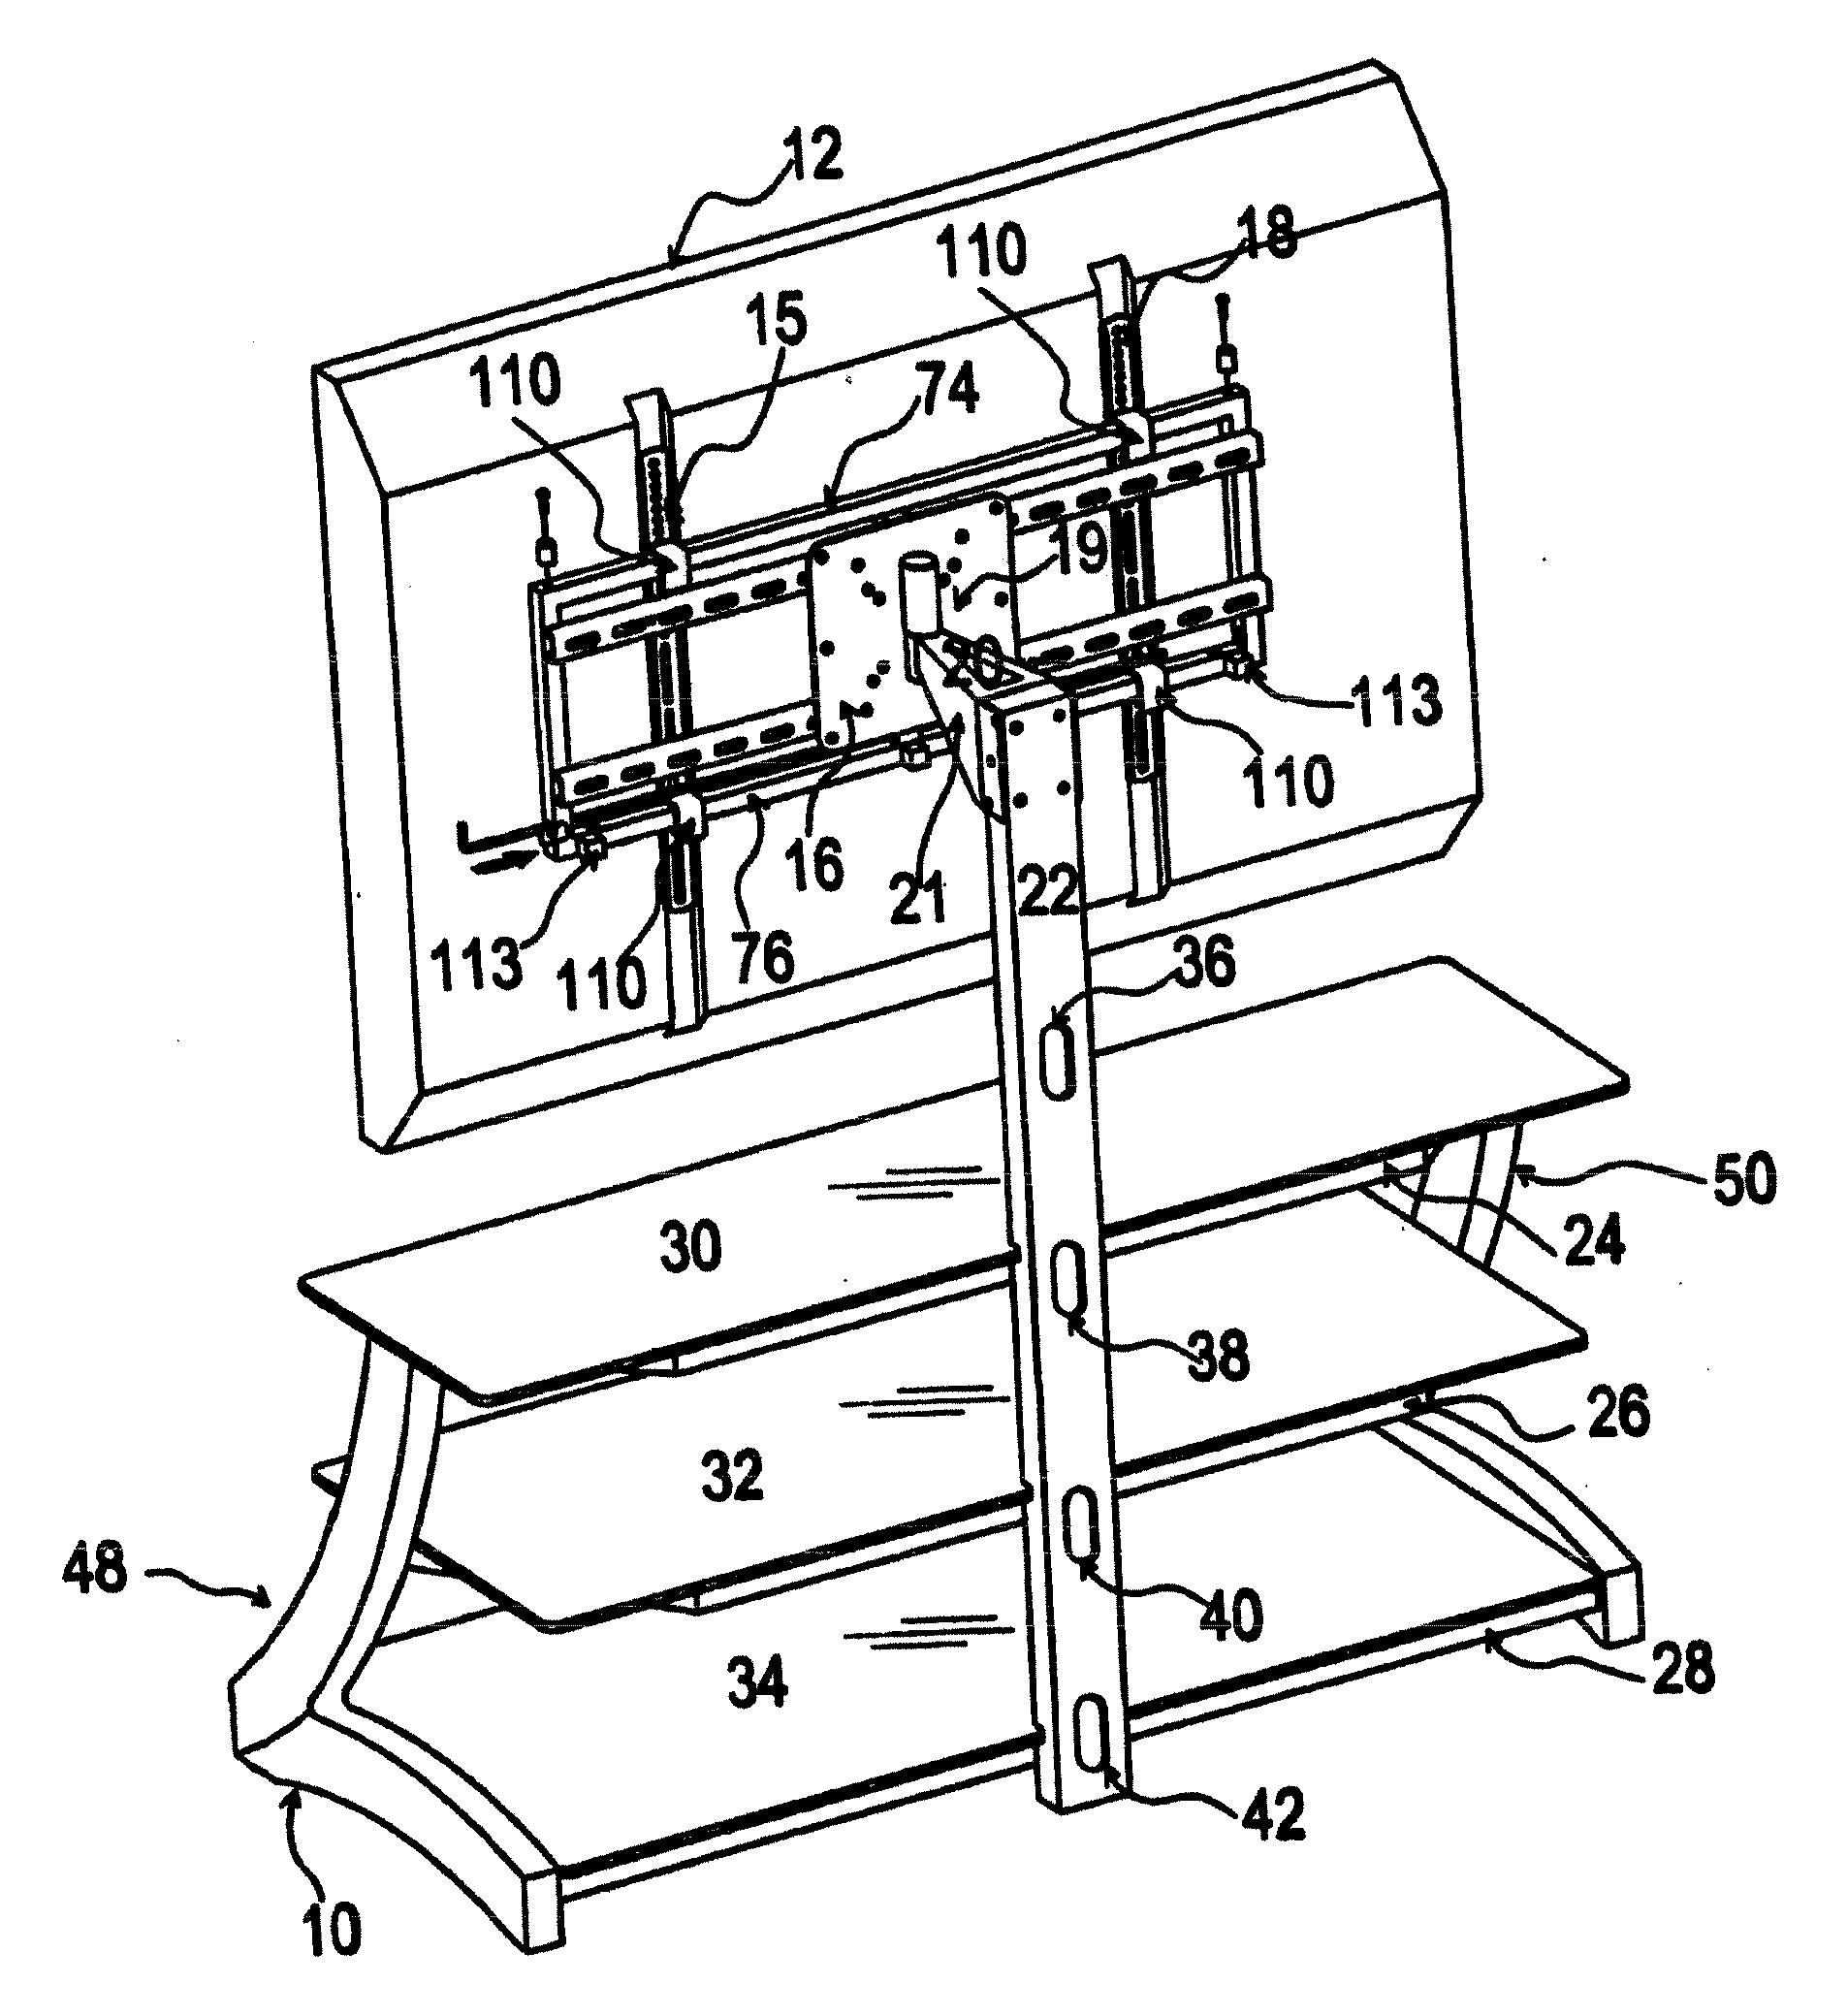 greenheck wiring diagrams  greenheck  free engine image